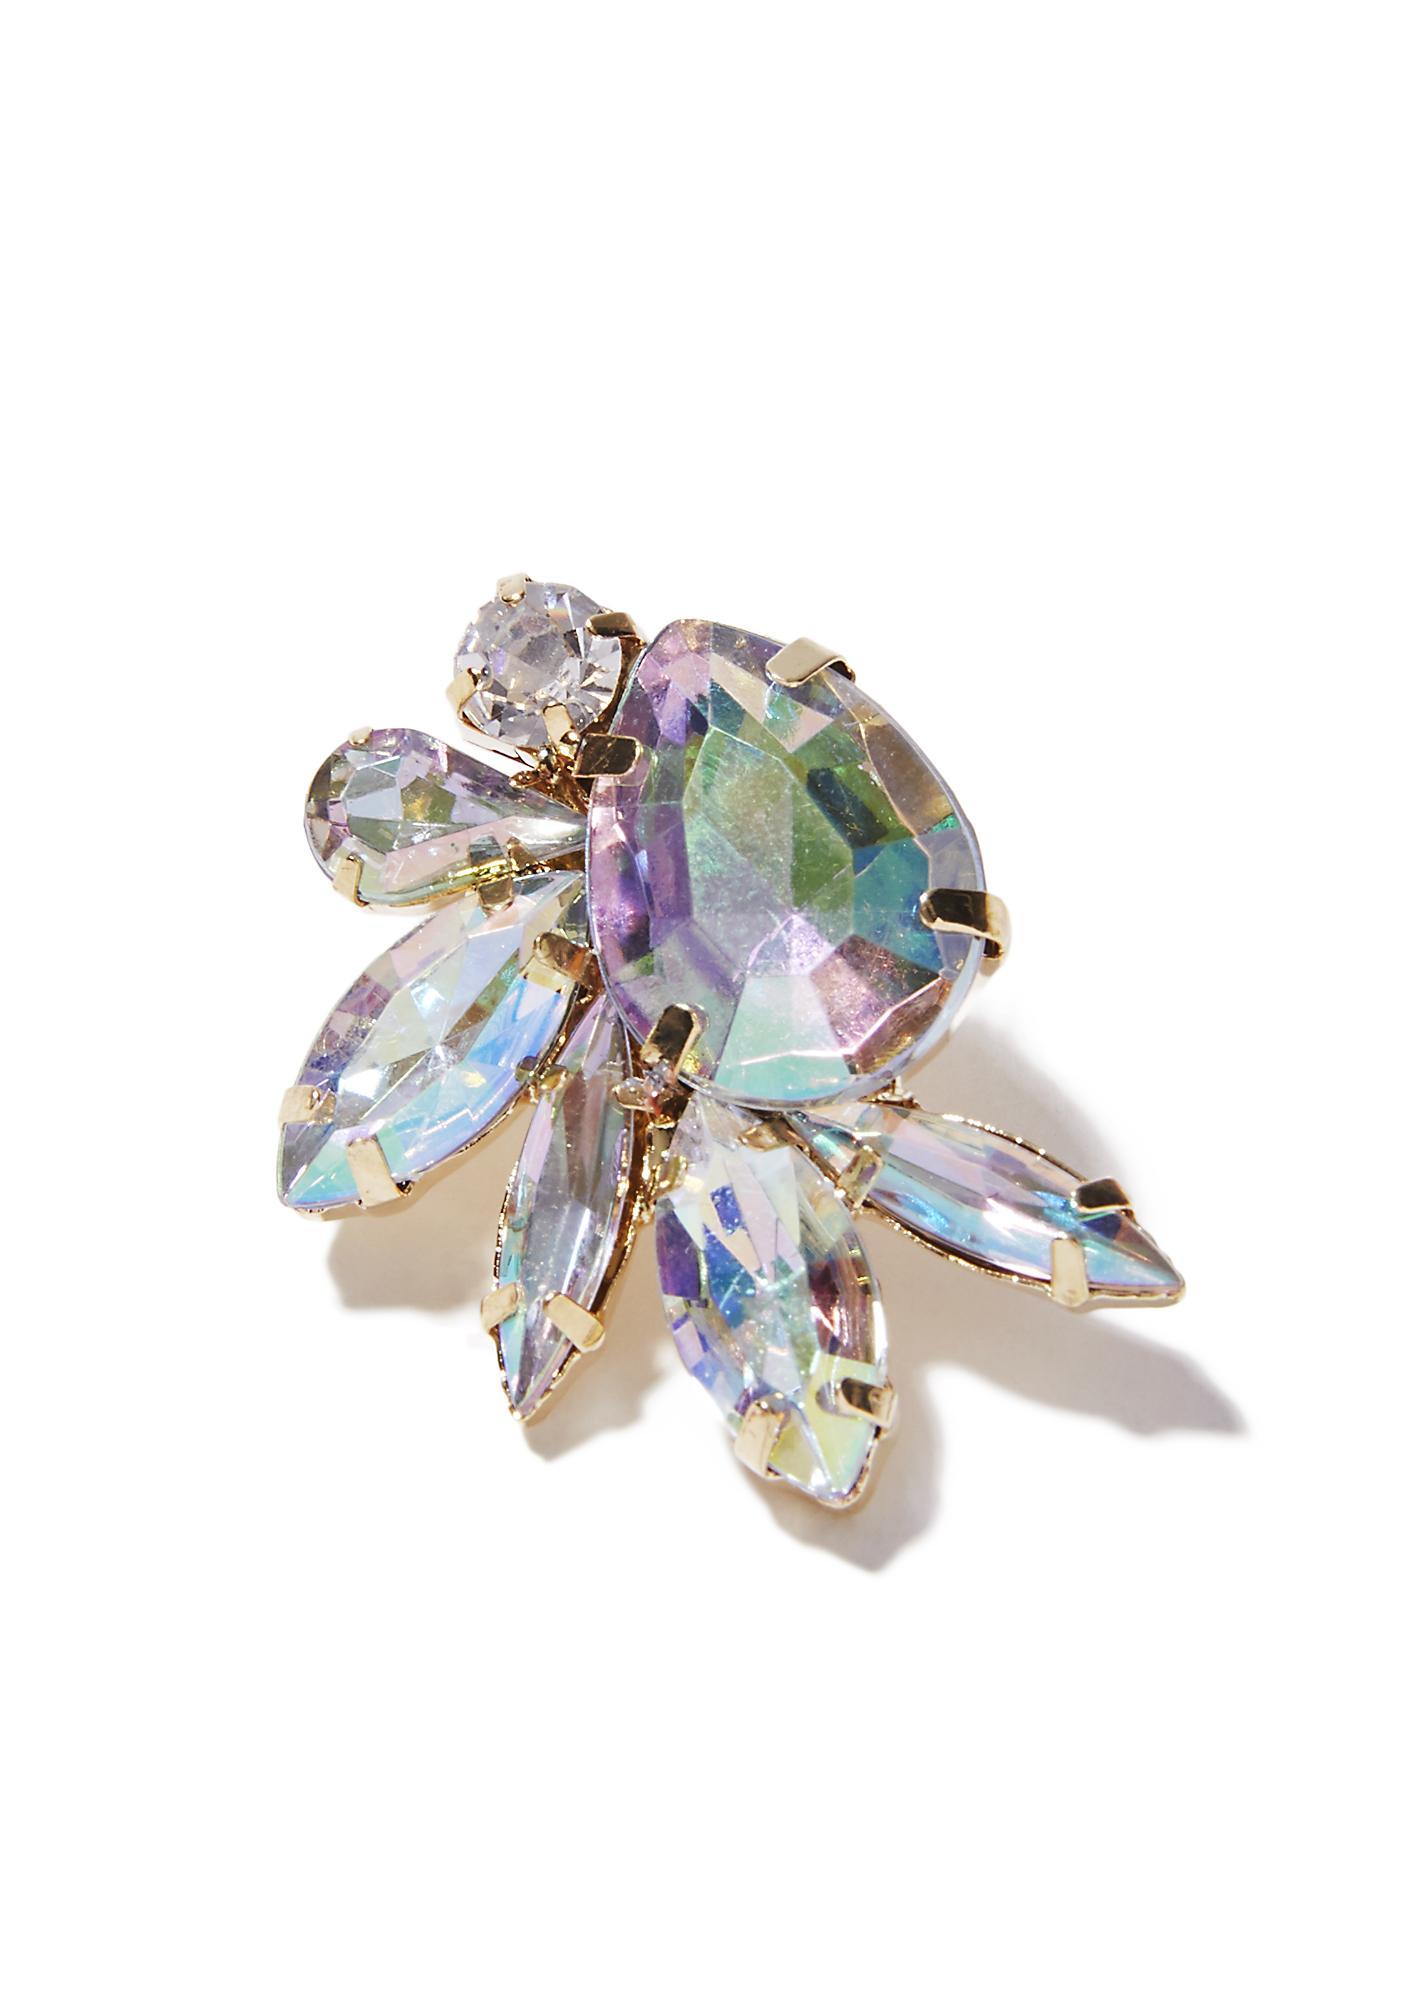 Precious Stones Earrings